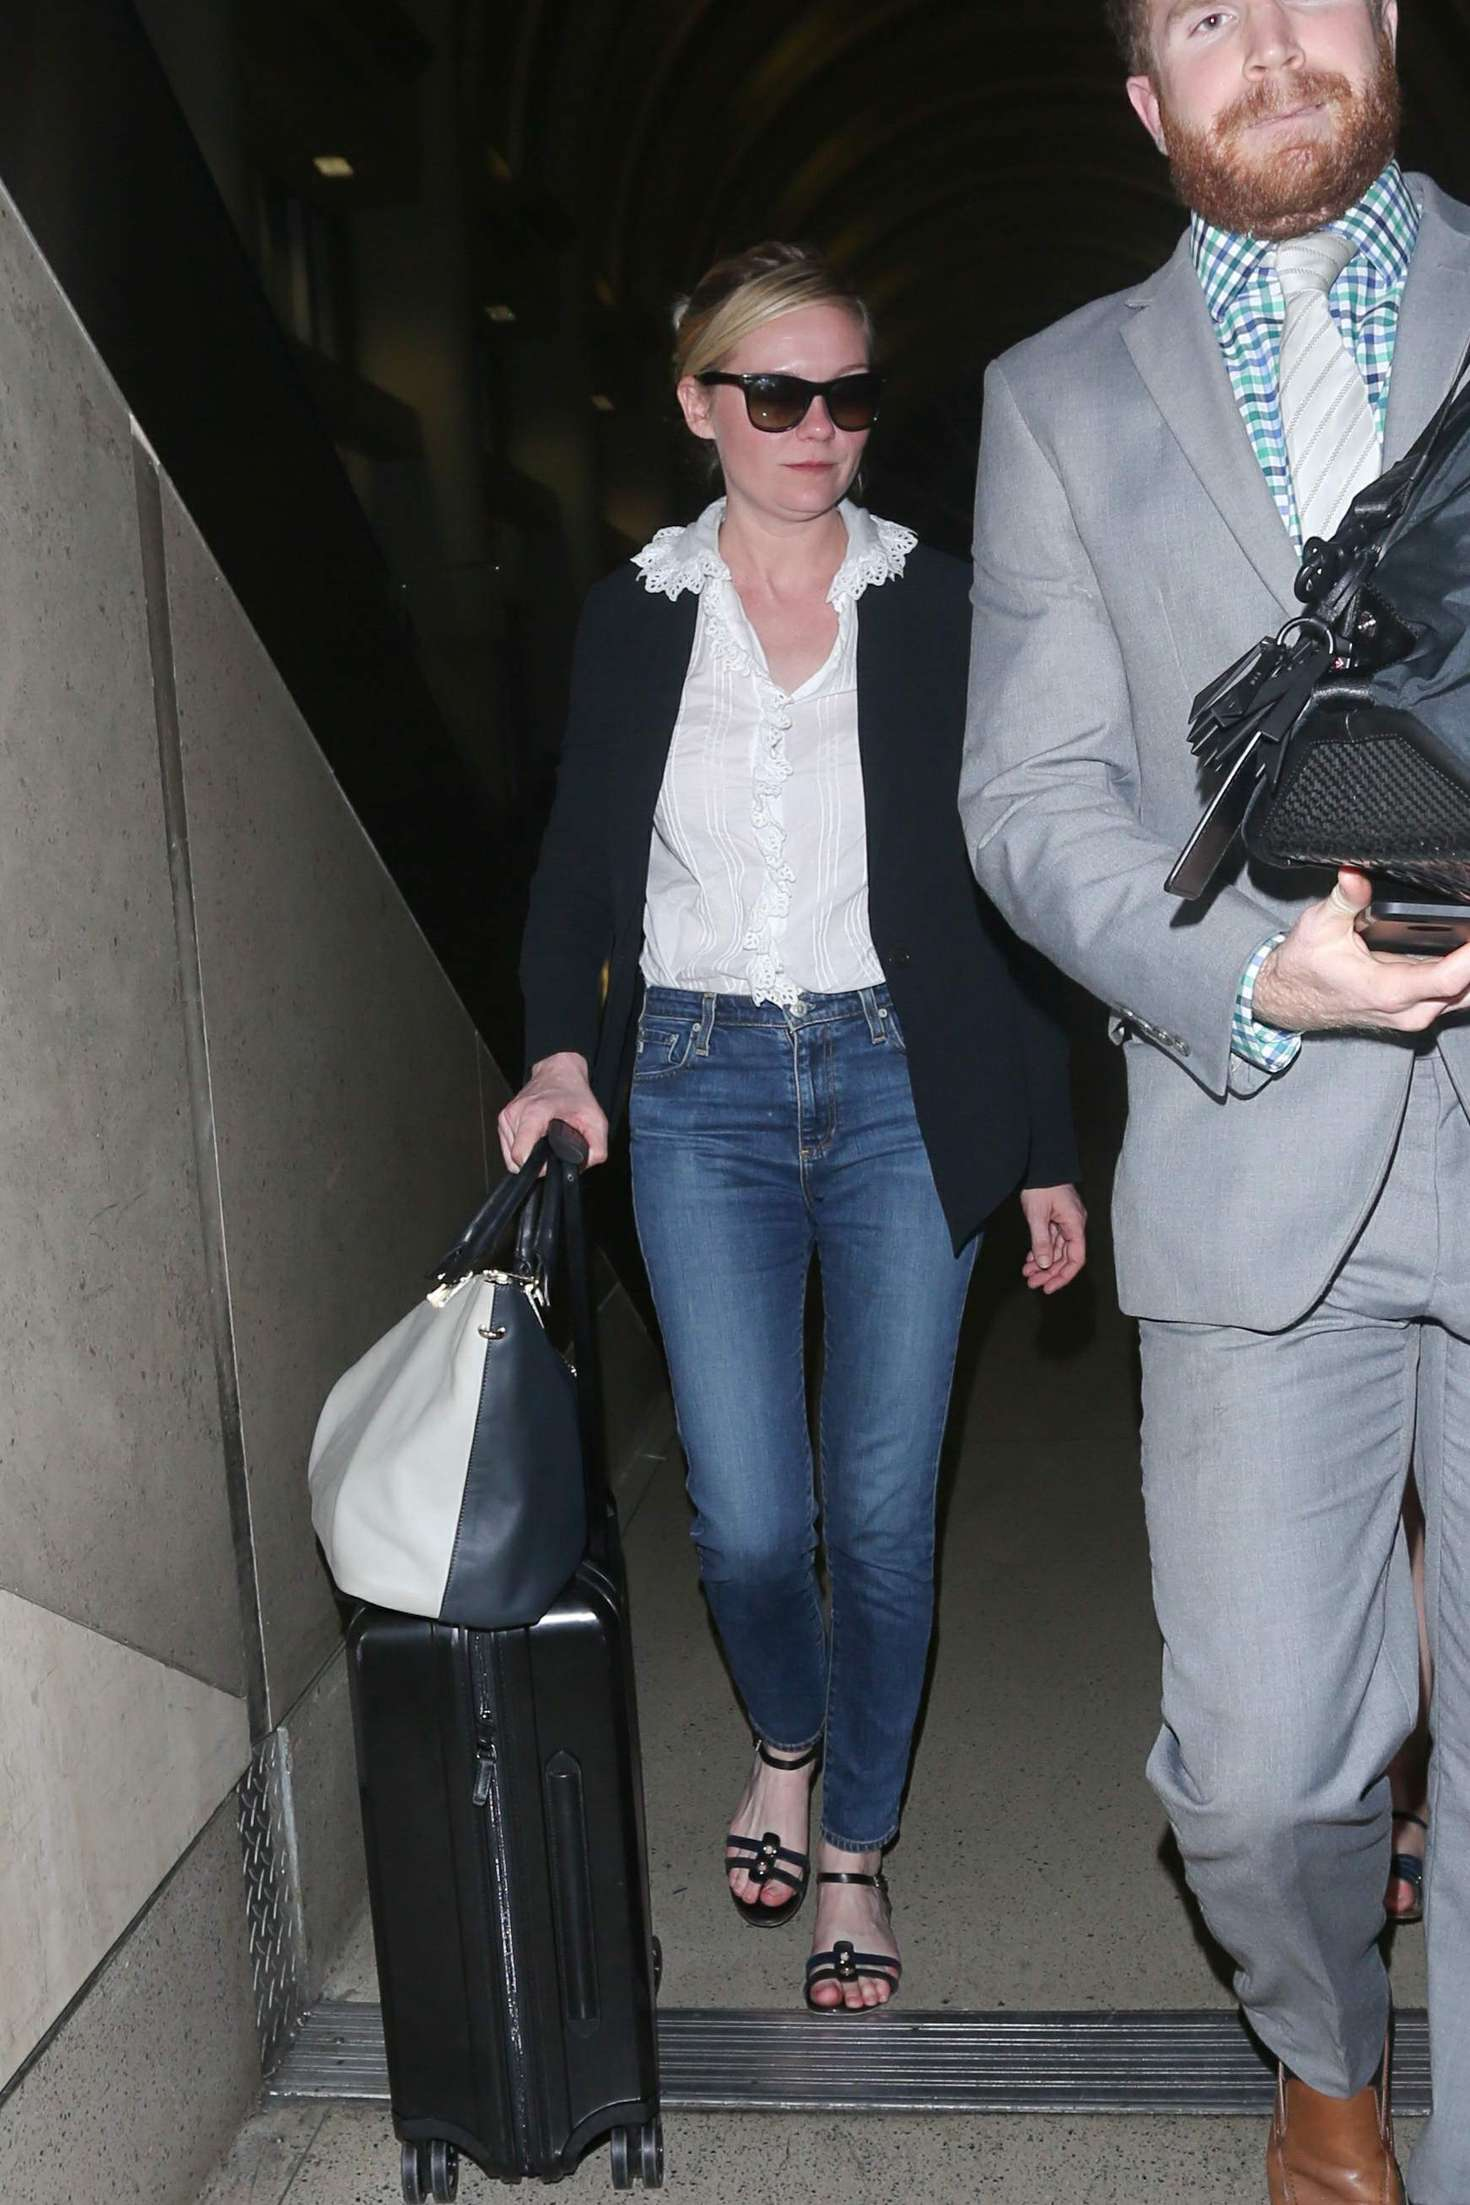 Kirsten Dunst 2016 : Kirsten Dunst at LAX Airport -03